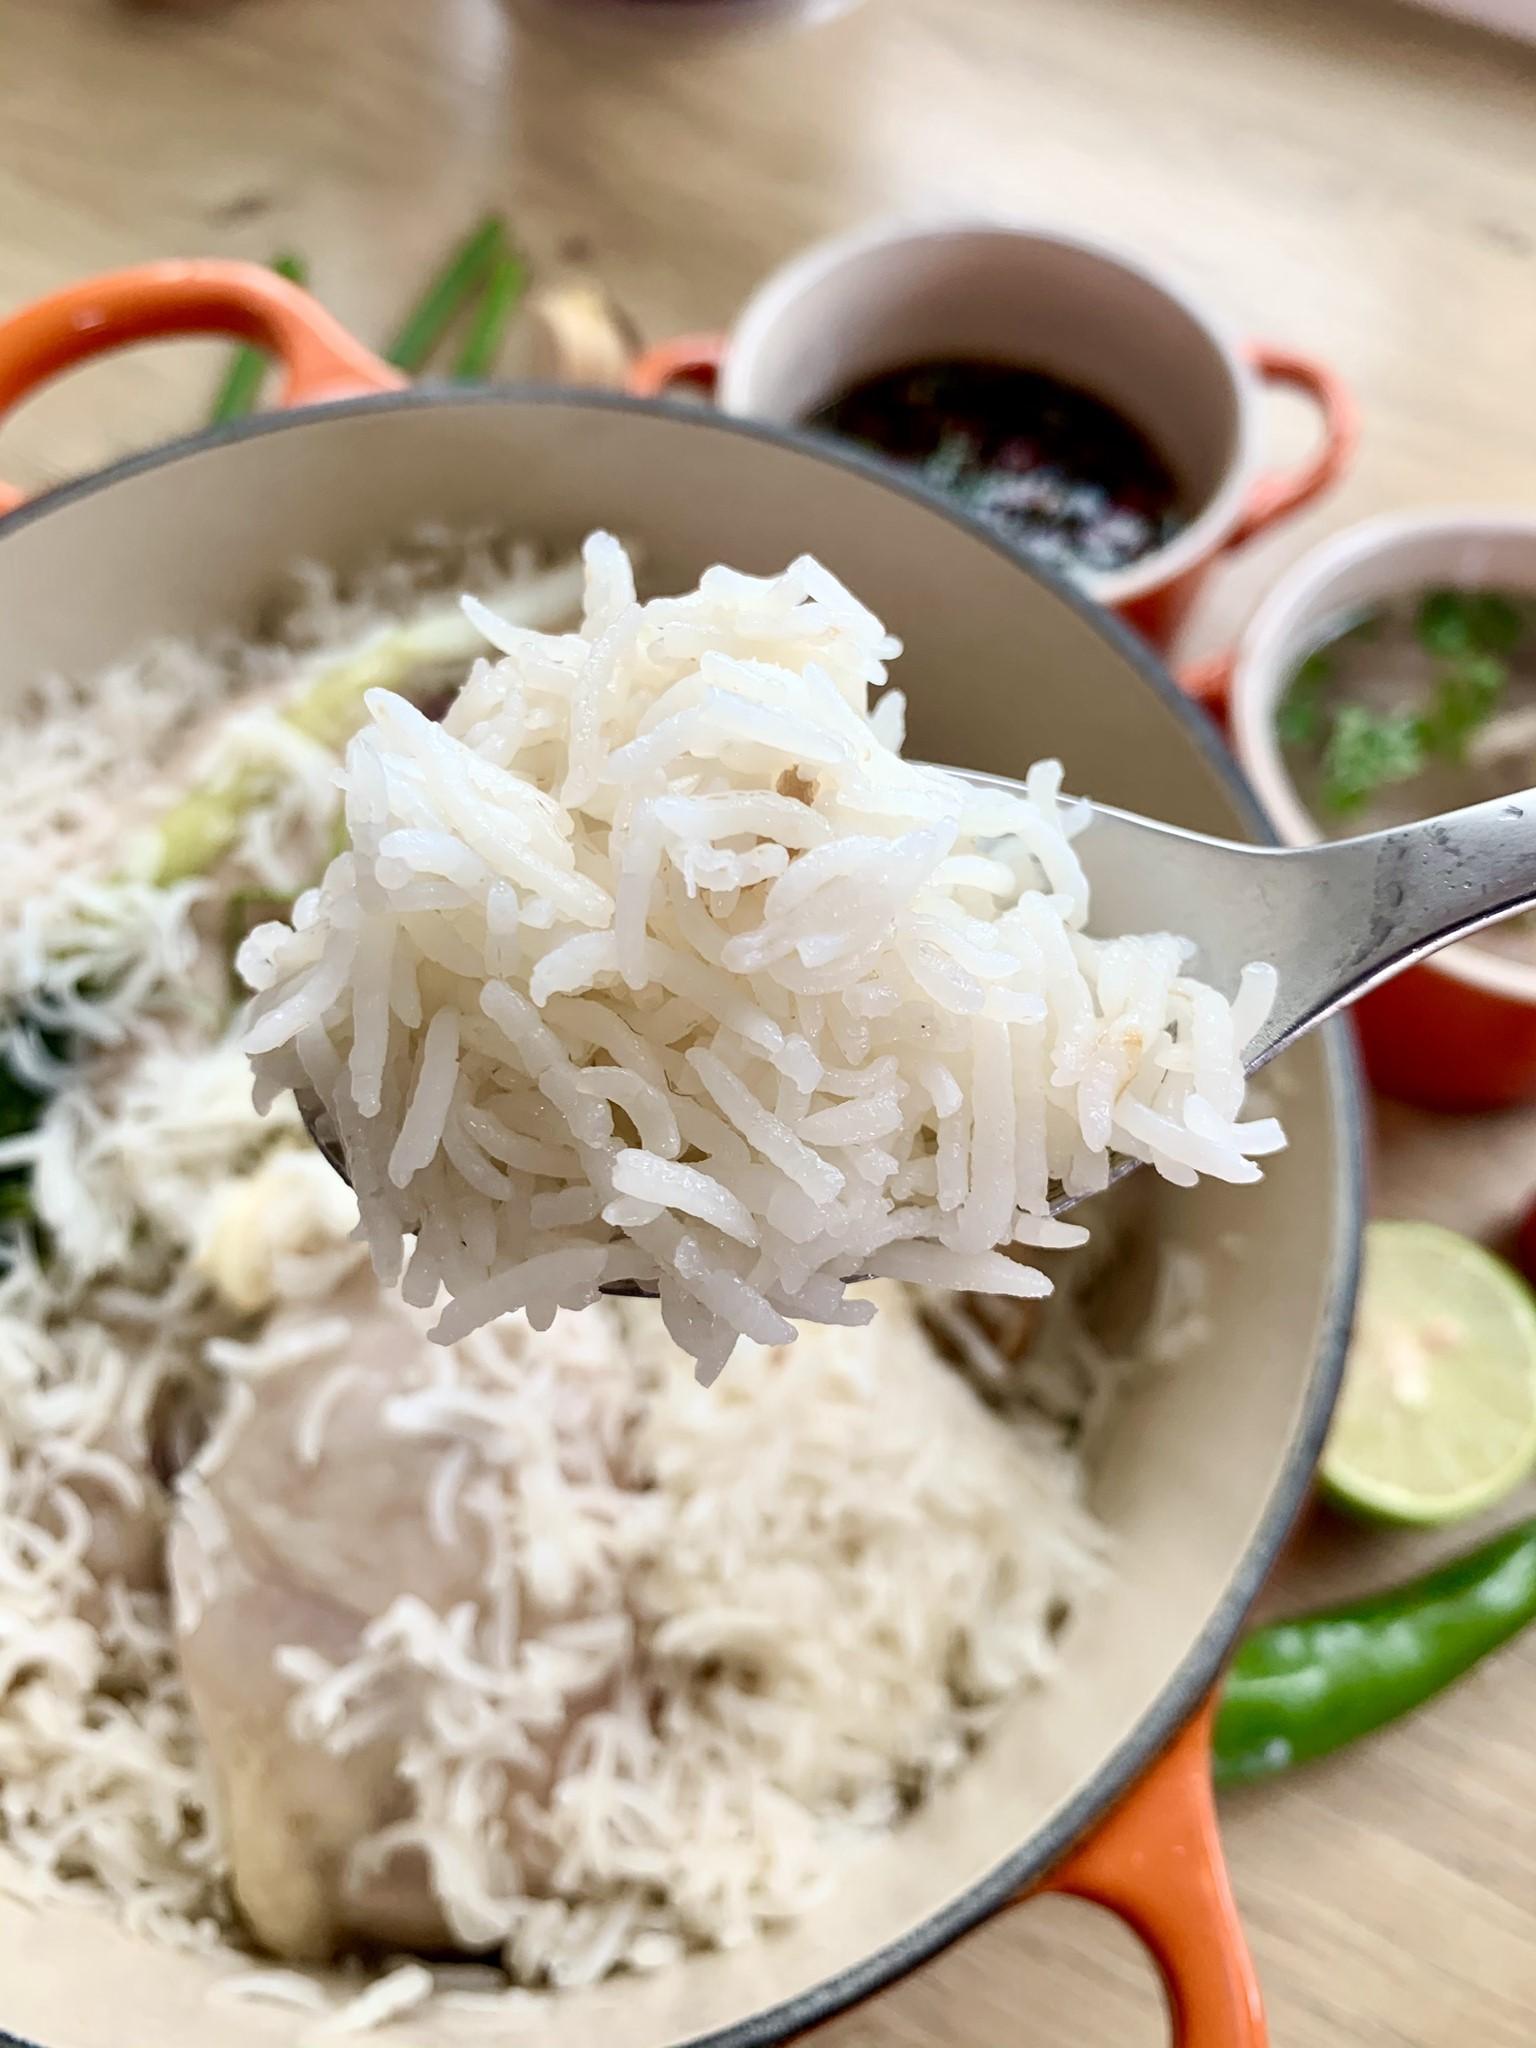 resepi nasi ayam hainan kegemaran anak  senang sedap Resepi Nasi Ayam Azlina Ina Enak dan Mudah